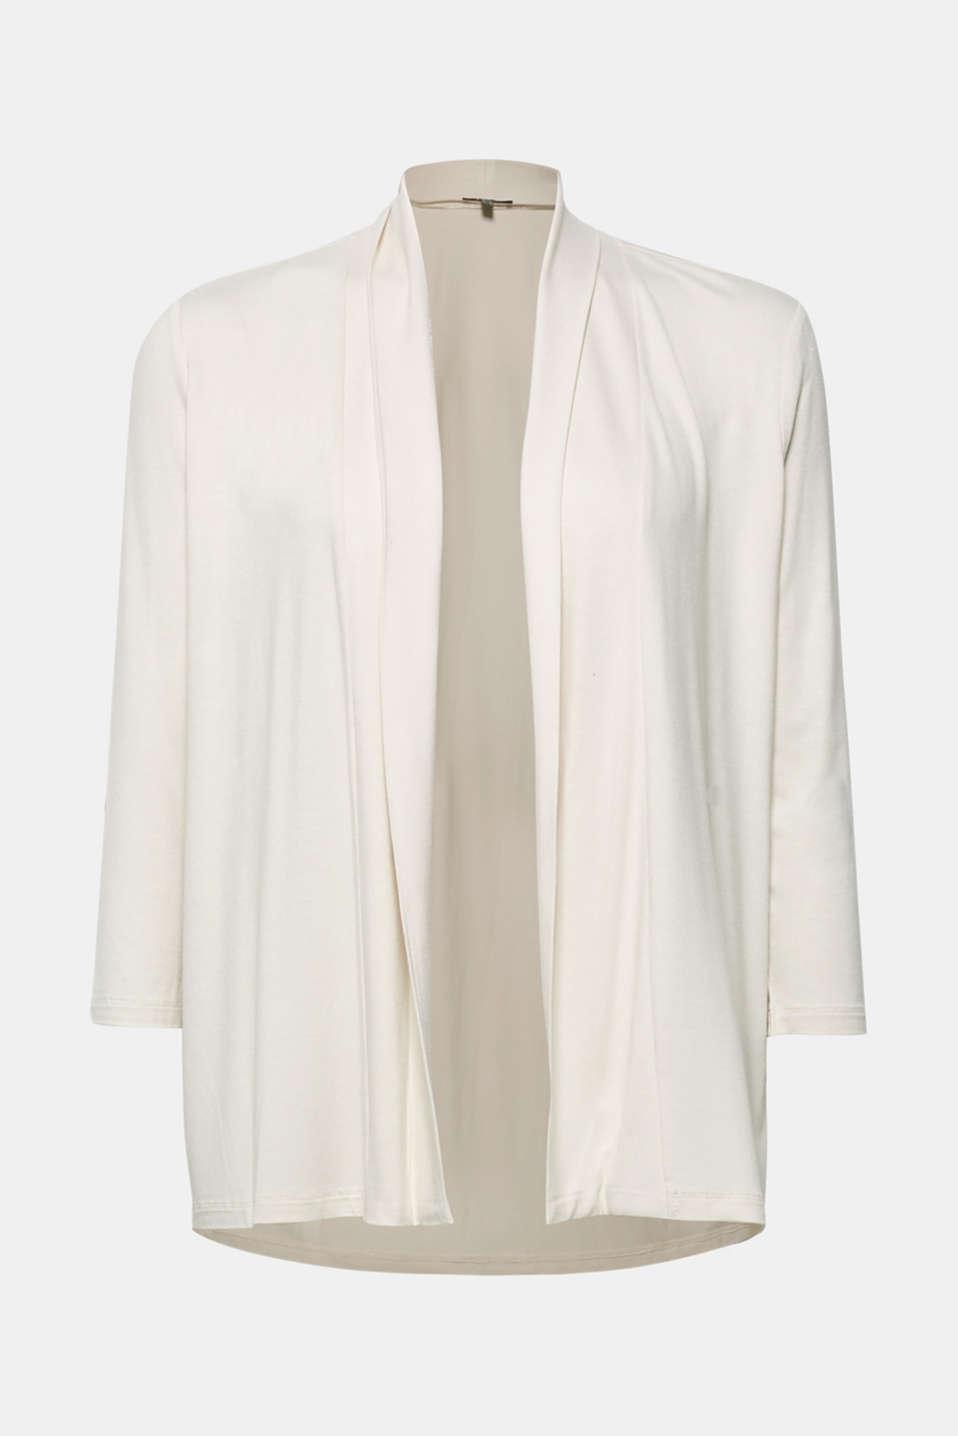 Open stretch jersey cardigan, LIGHT BEIGE, detail image number 6